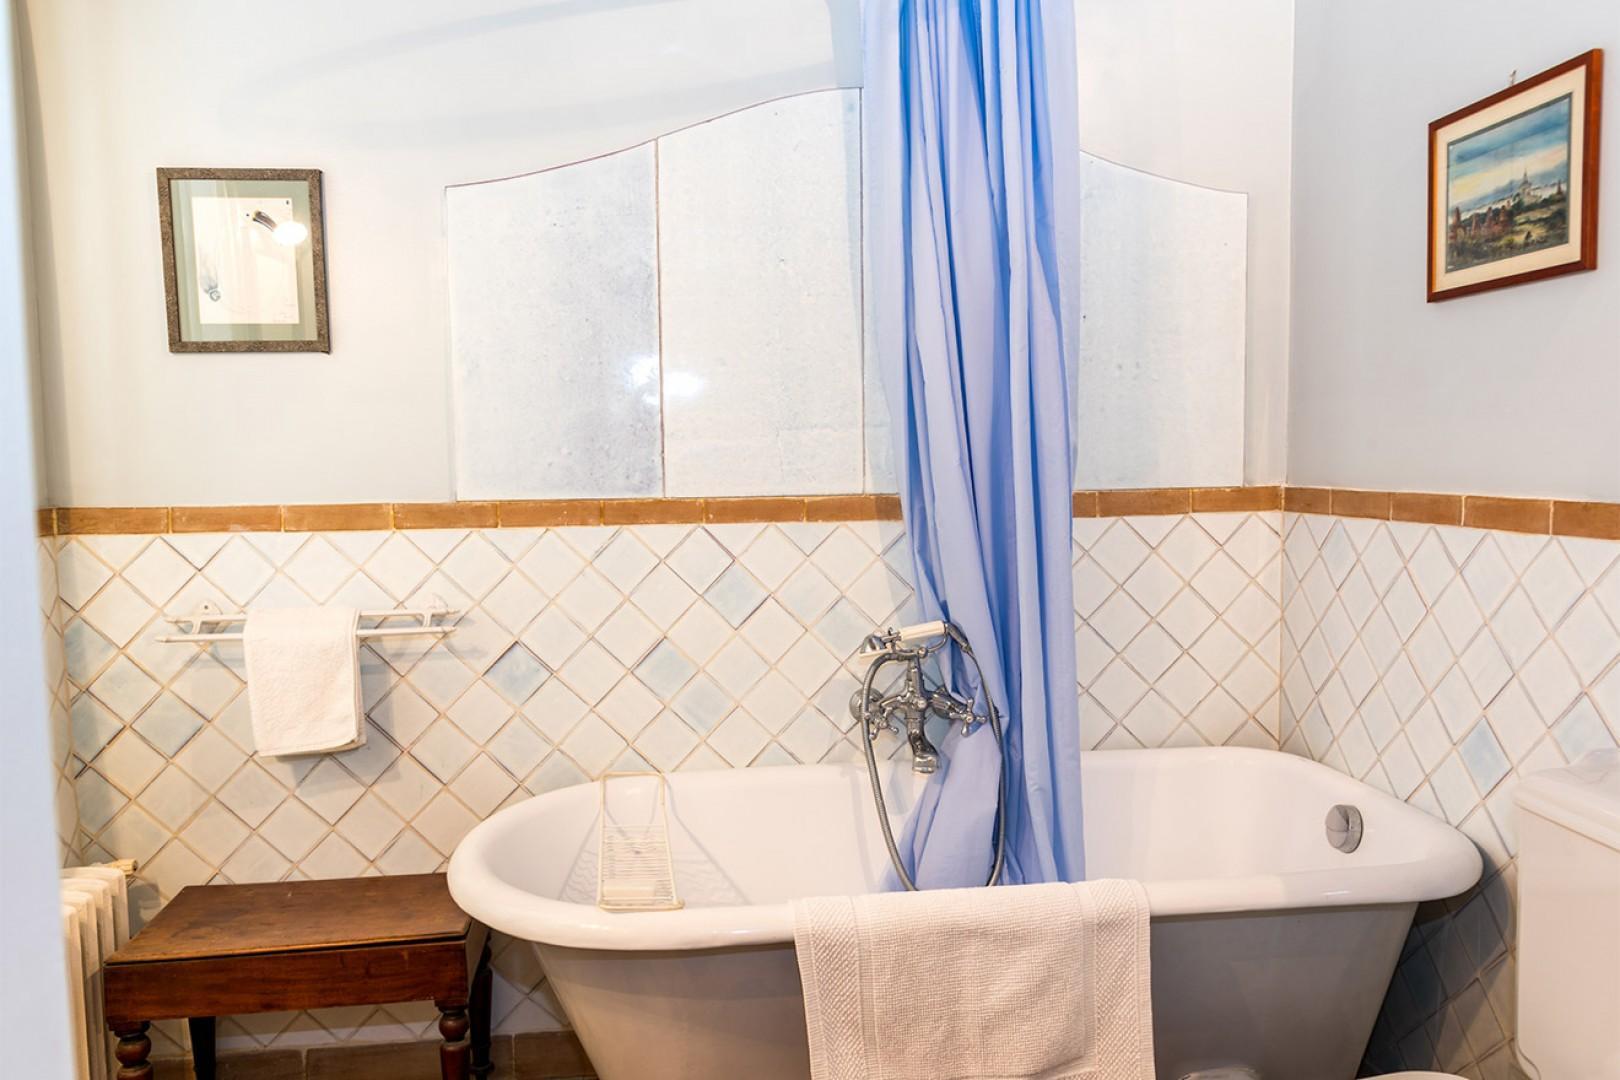 Take a soak in the beautiful antique claw-footed bathtub.